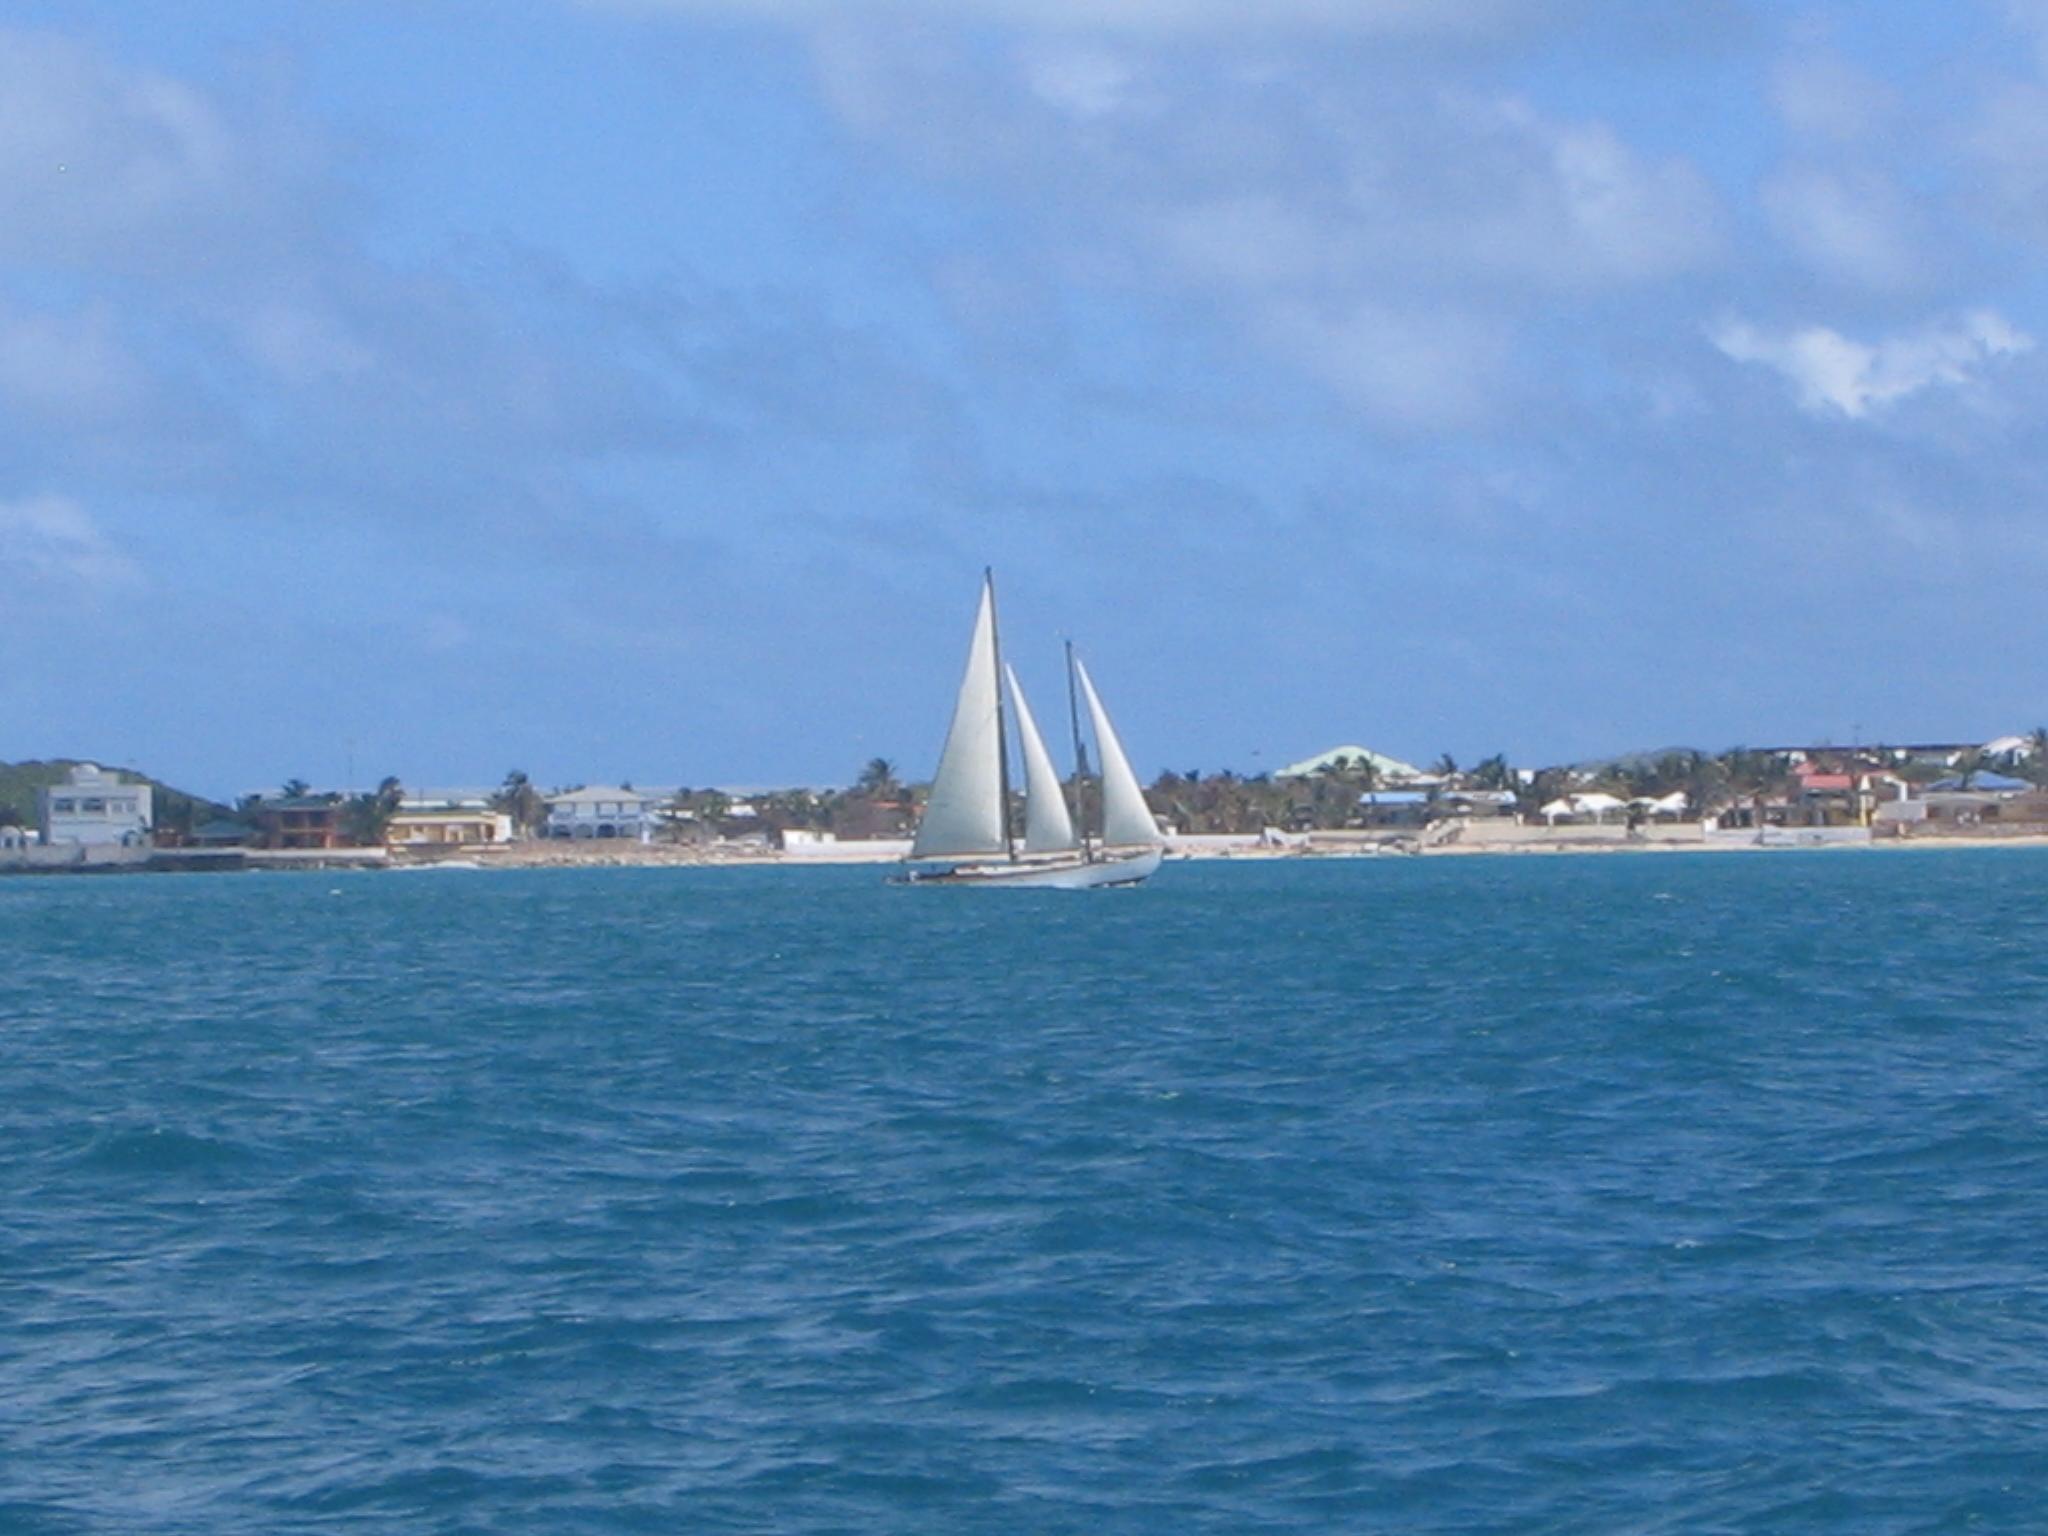 sailing along side a sloop